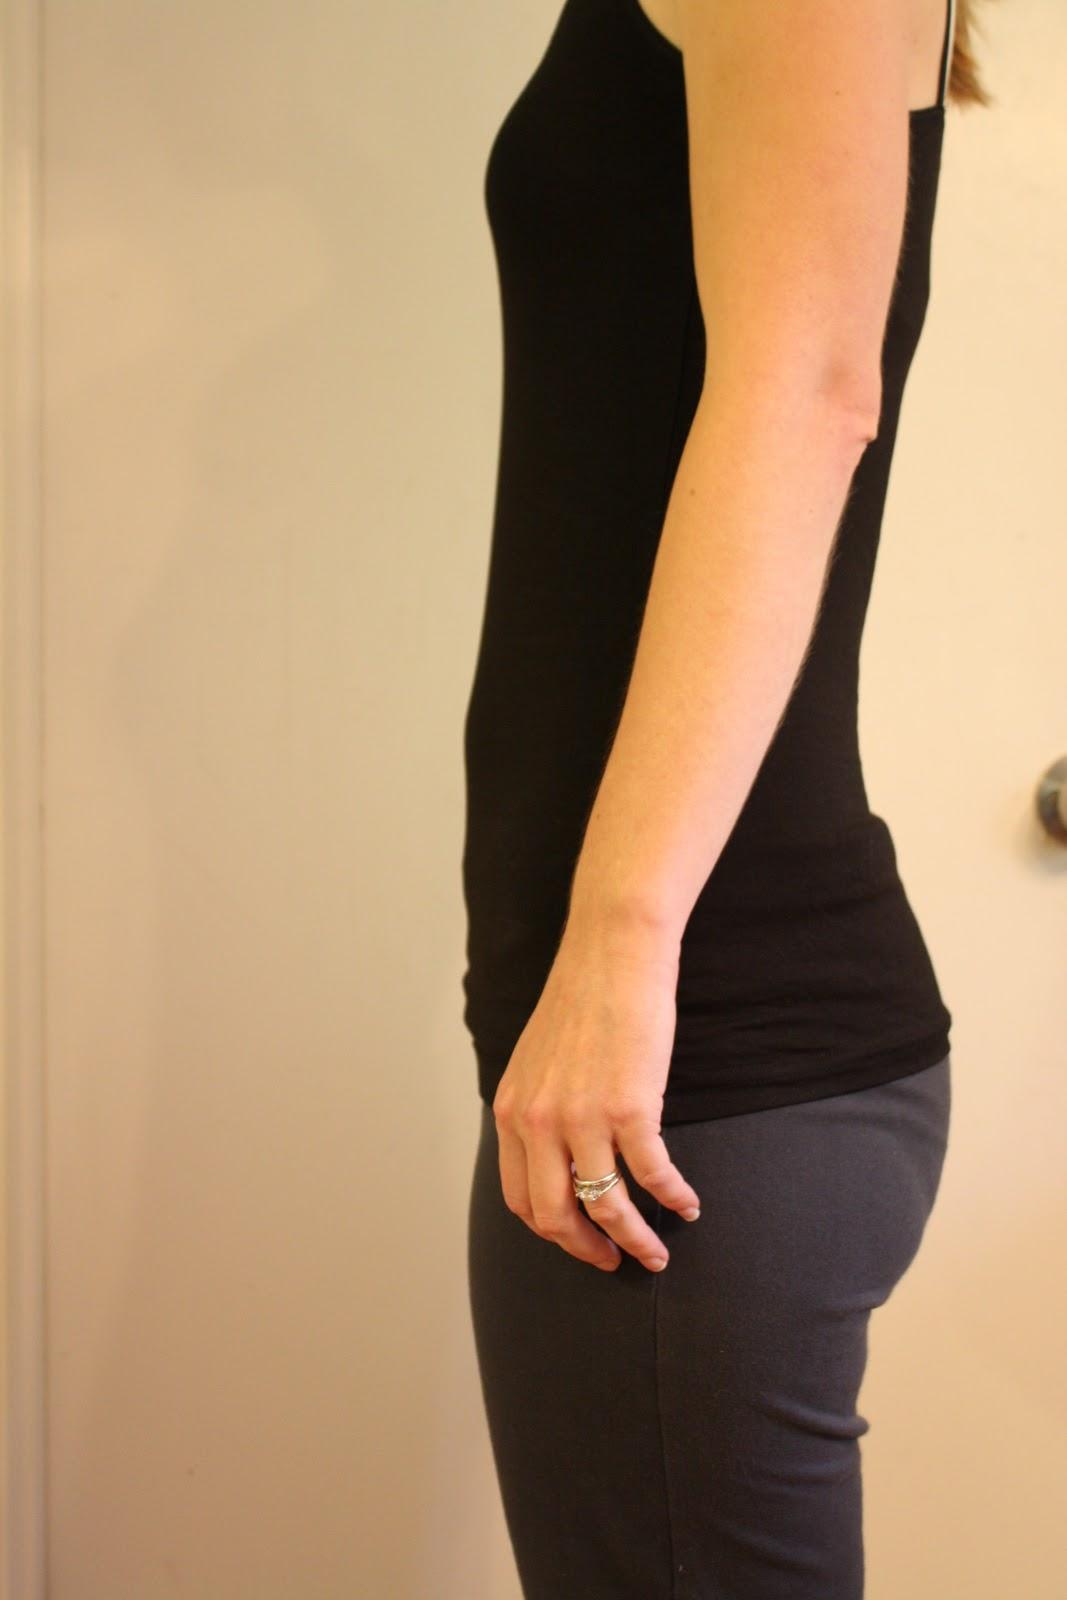 Тянущие боли живота при беременности на 37 неделе